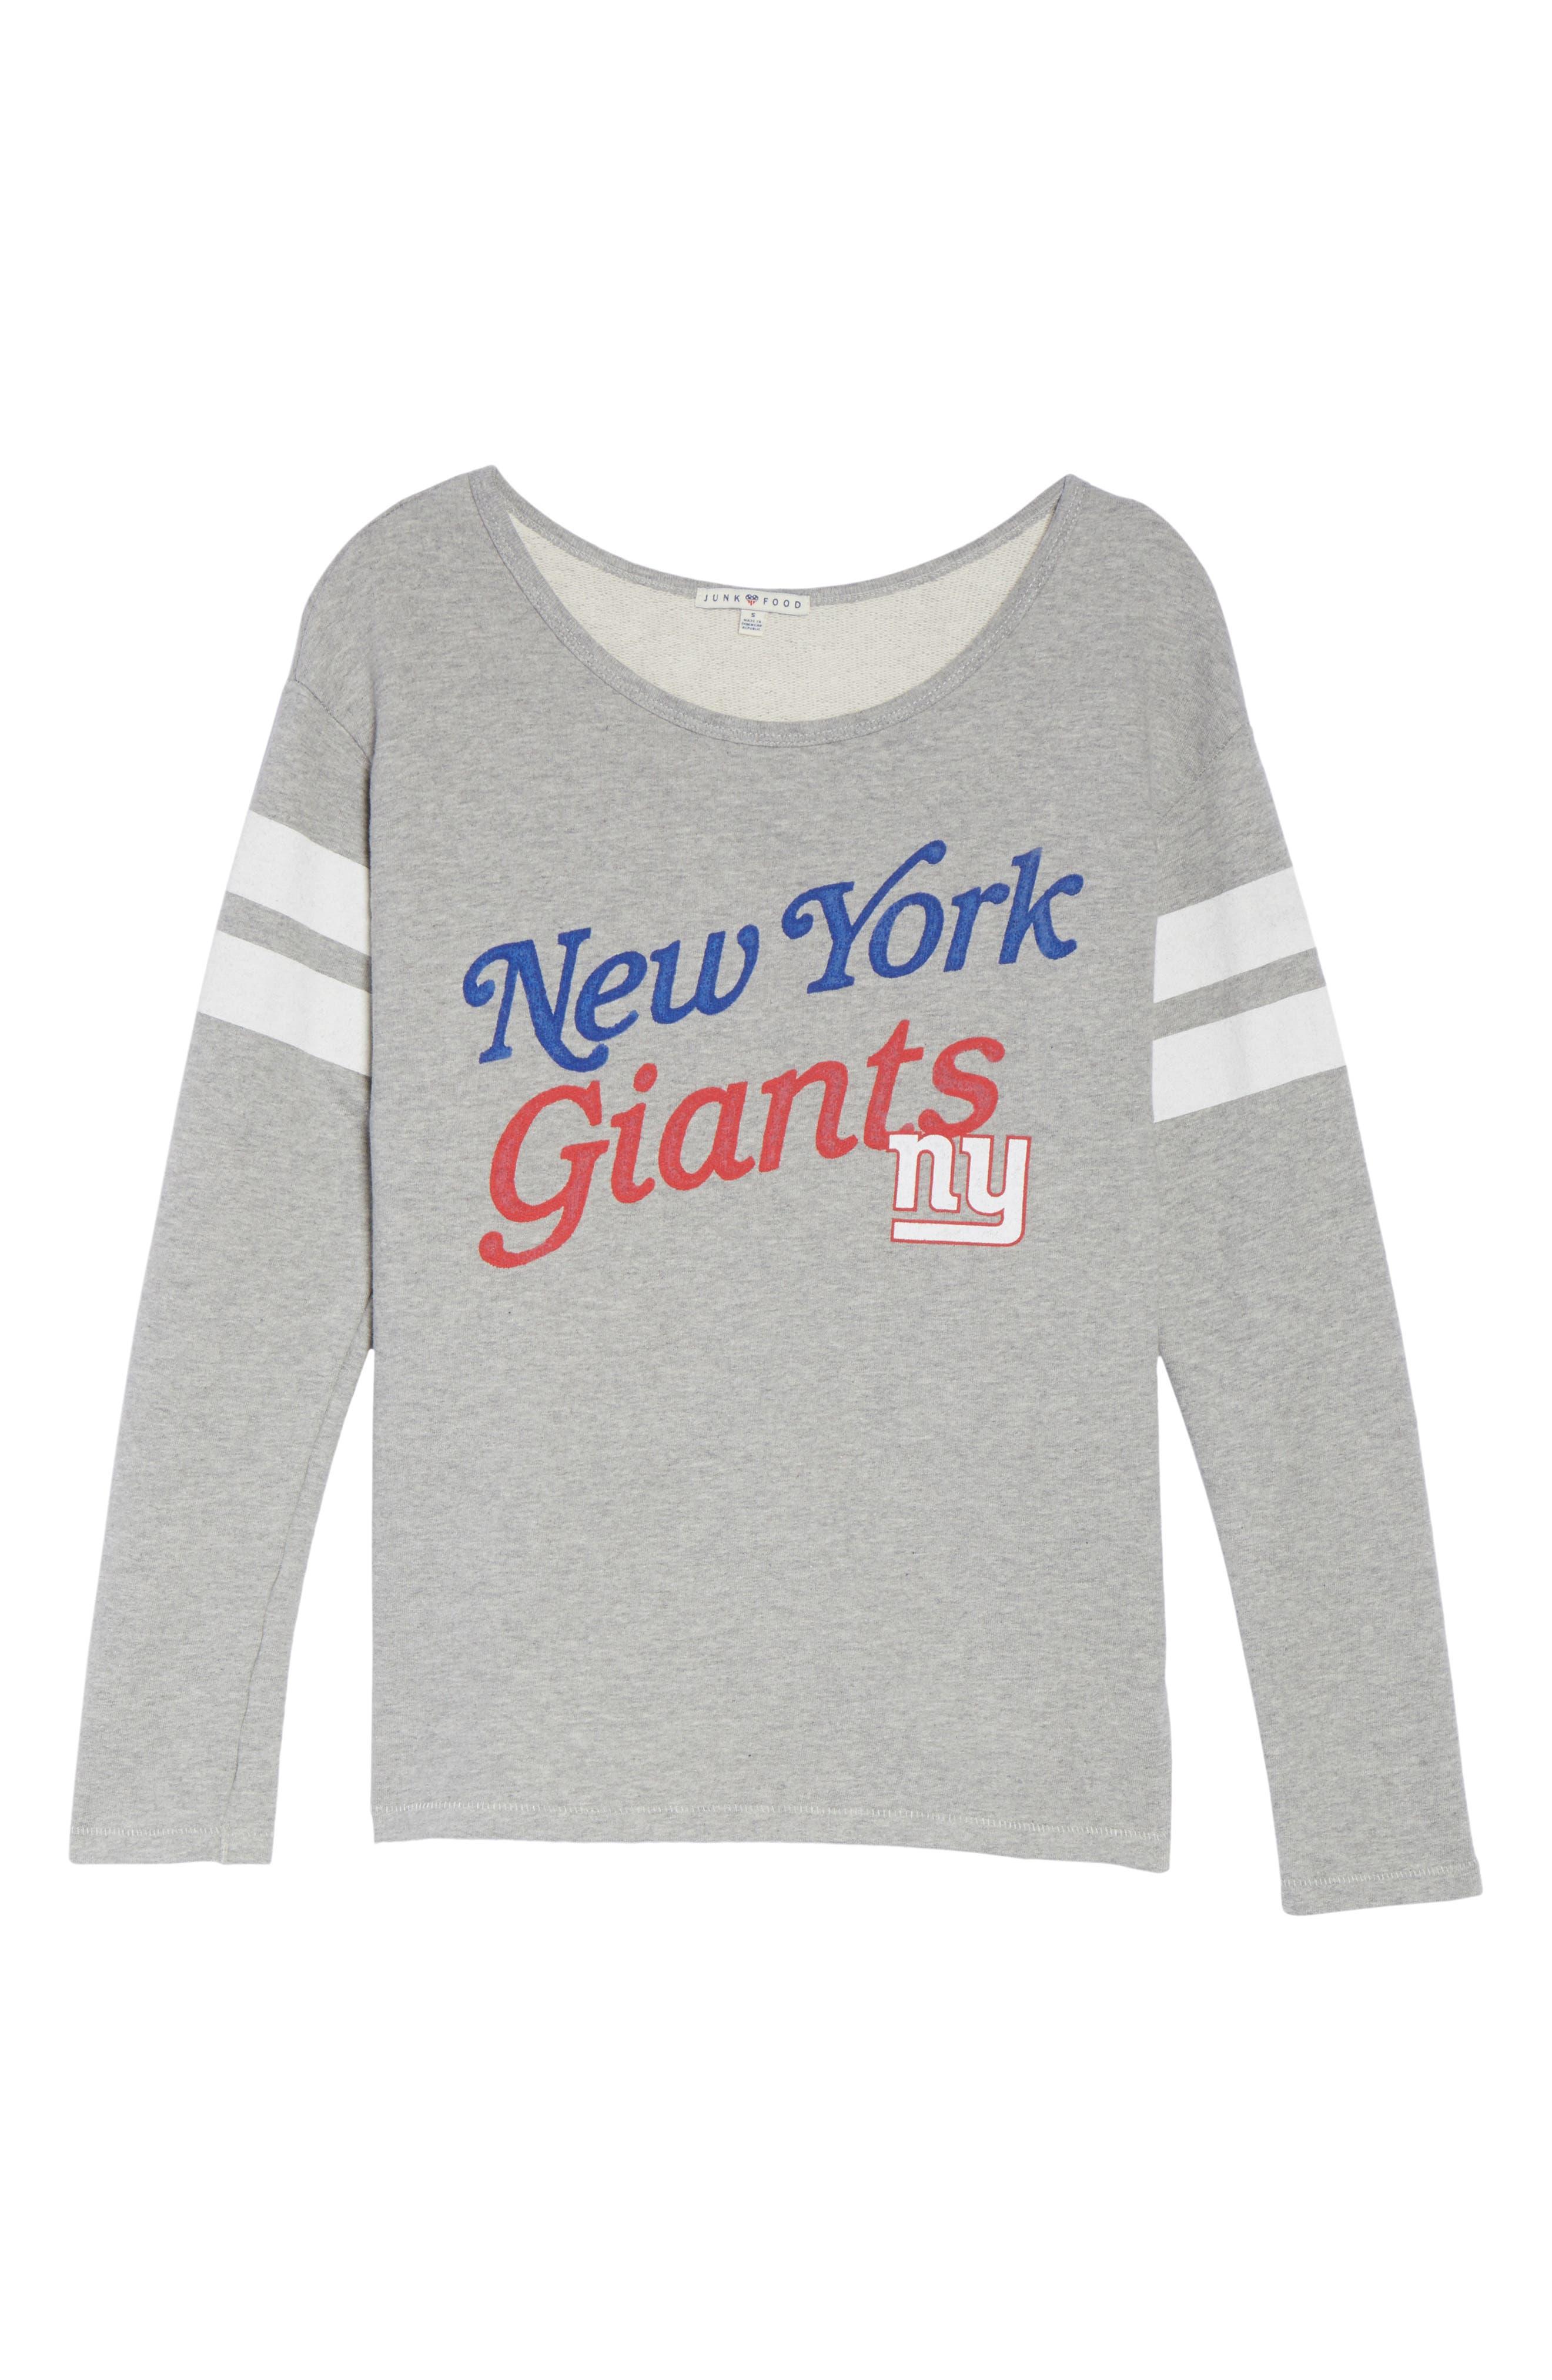 NFL New York Giants Champion Sweatshirt,                             Alternate thumbnail 6, color,                             028